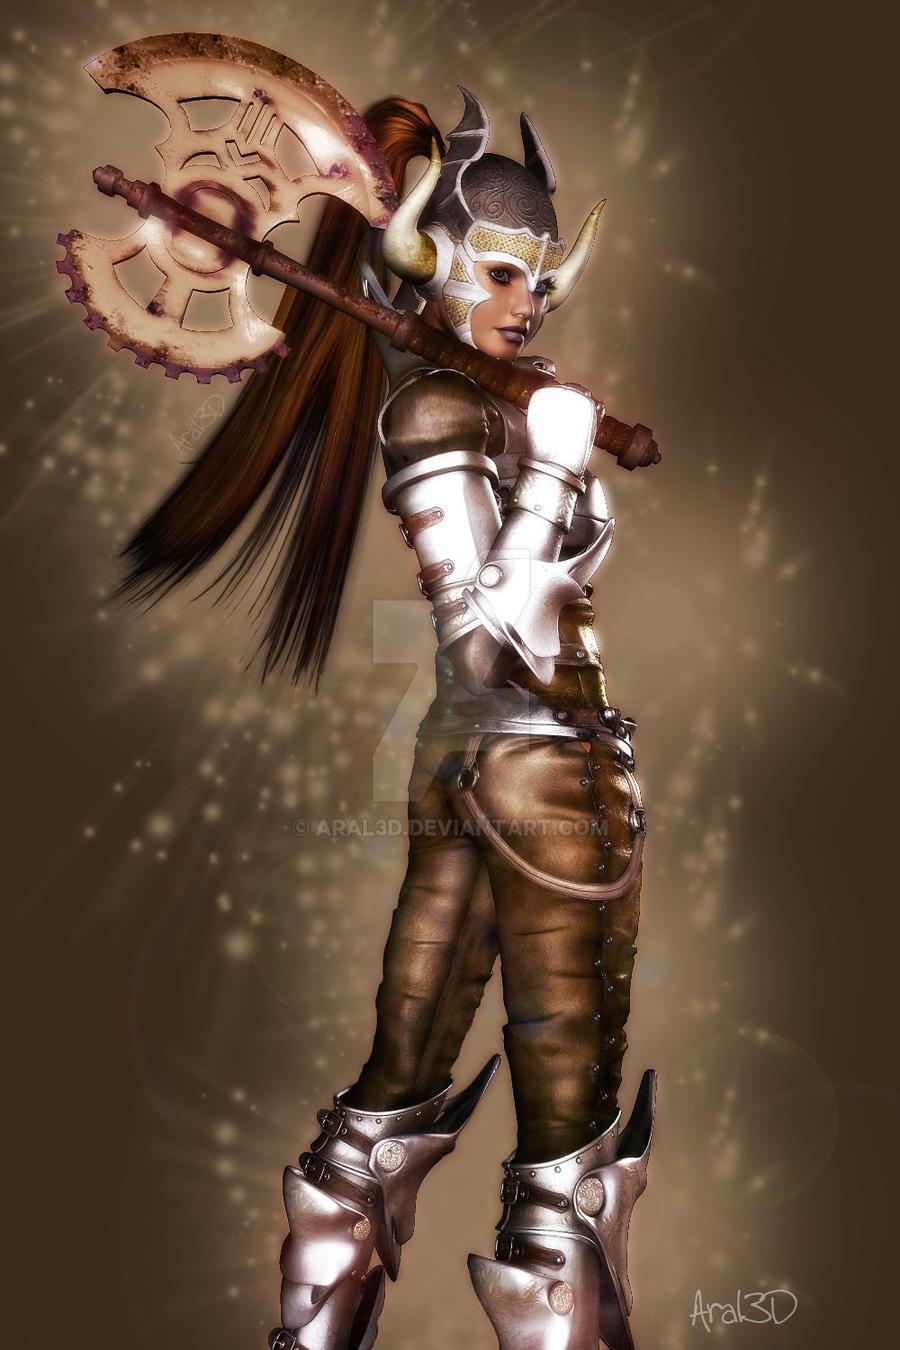 Axe warrior by Aral3D on DeviantArt